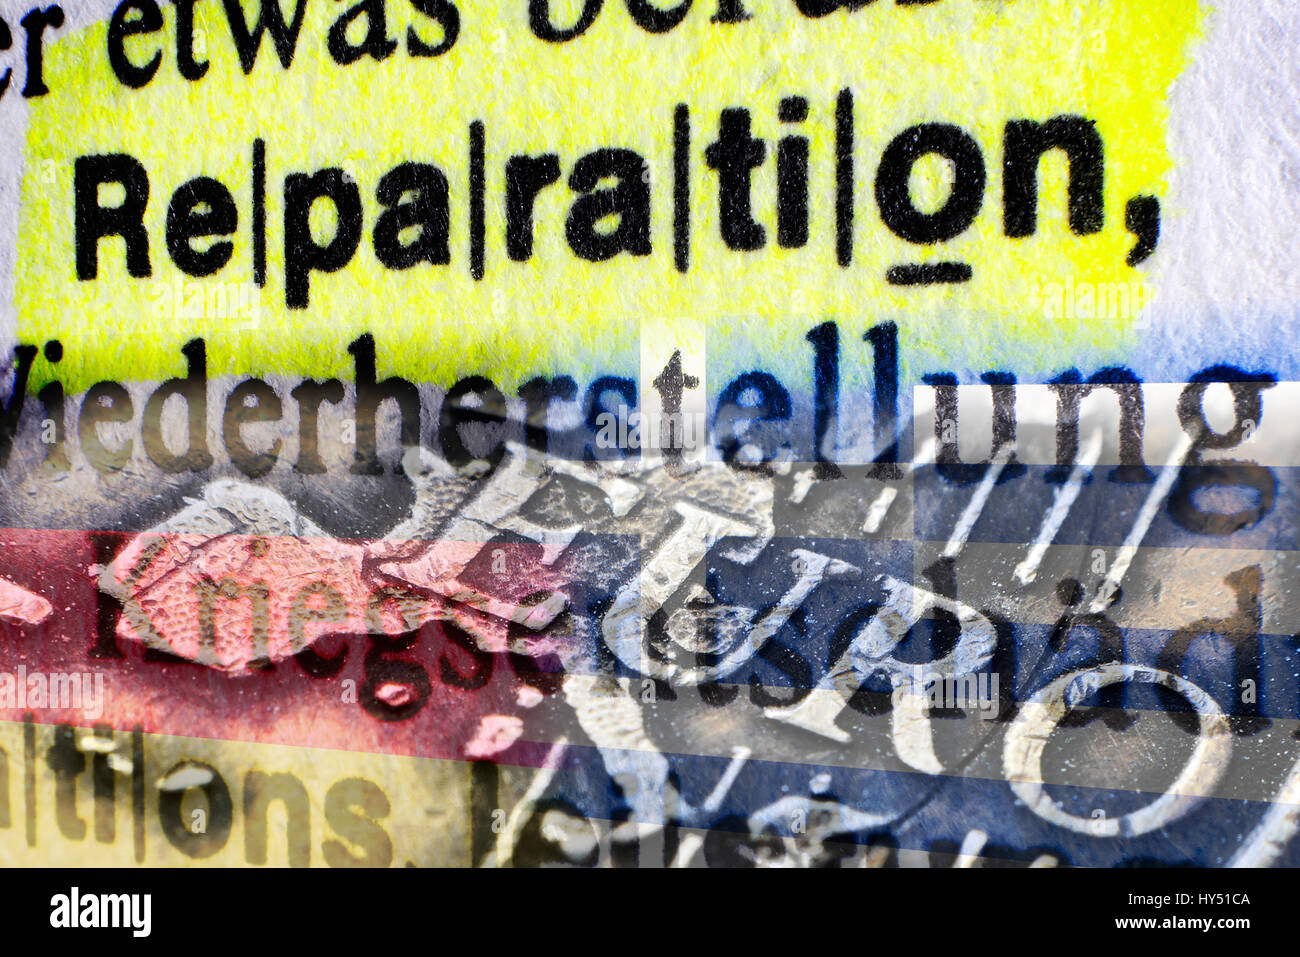 The word Reparation in a dictionary and eurocoin, Greek Reparationsforderungen, Das Wort Reparation in einem Woerterbuch Stock Photo